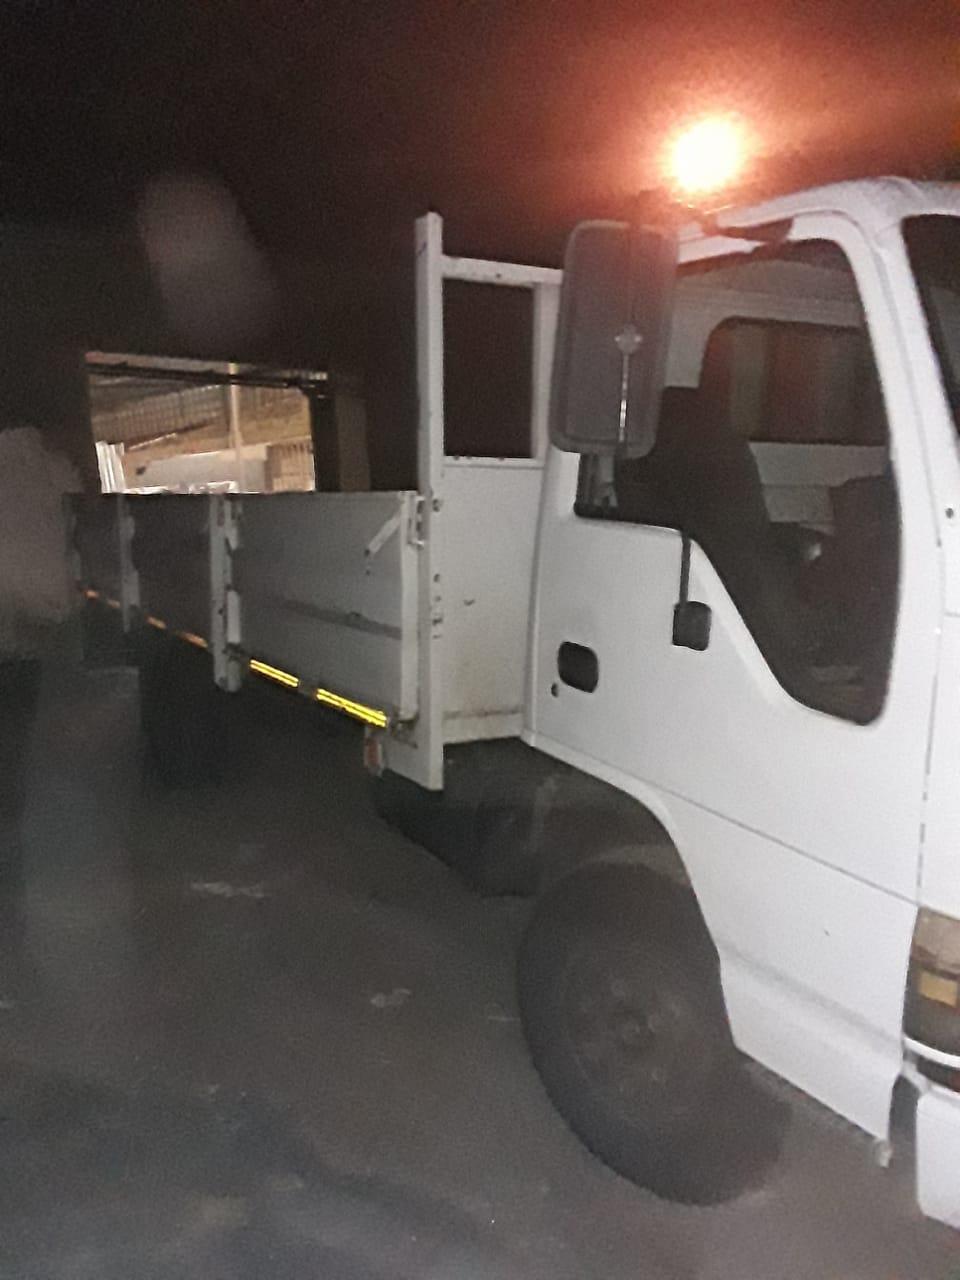 Çheapest Delivery, Best Customer Service